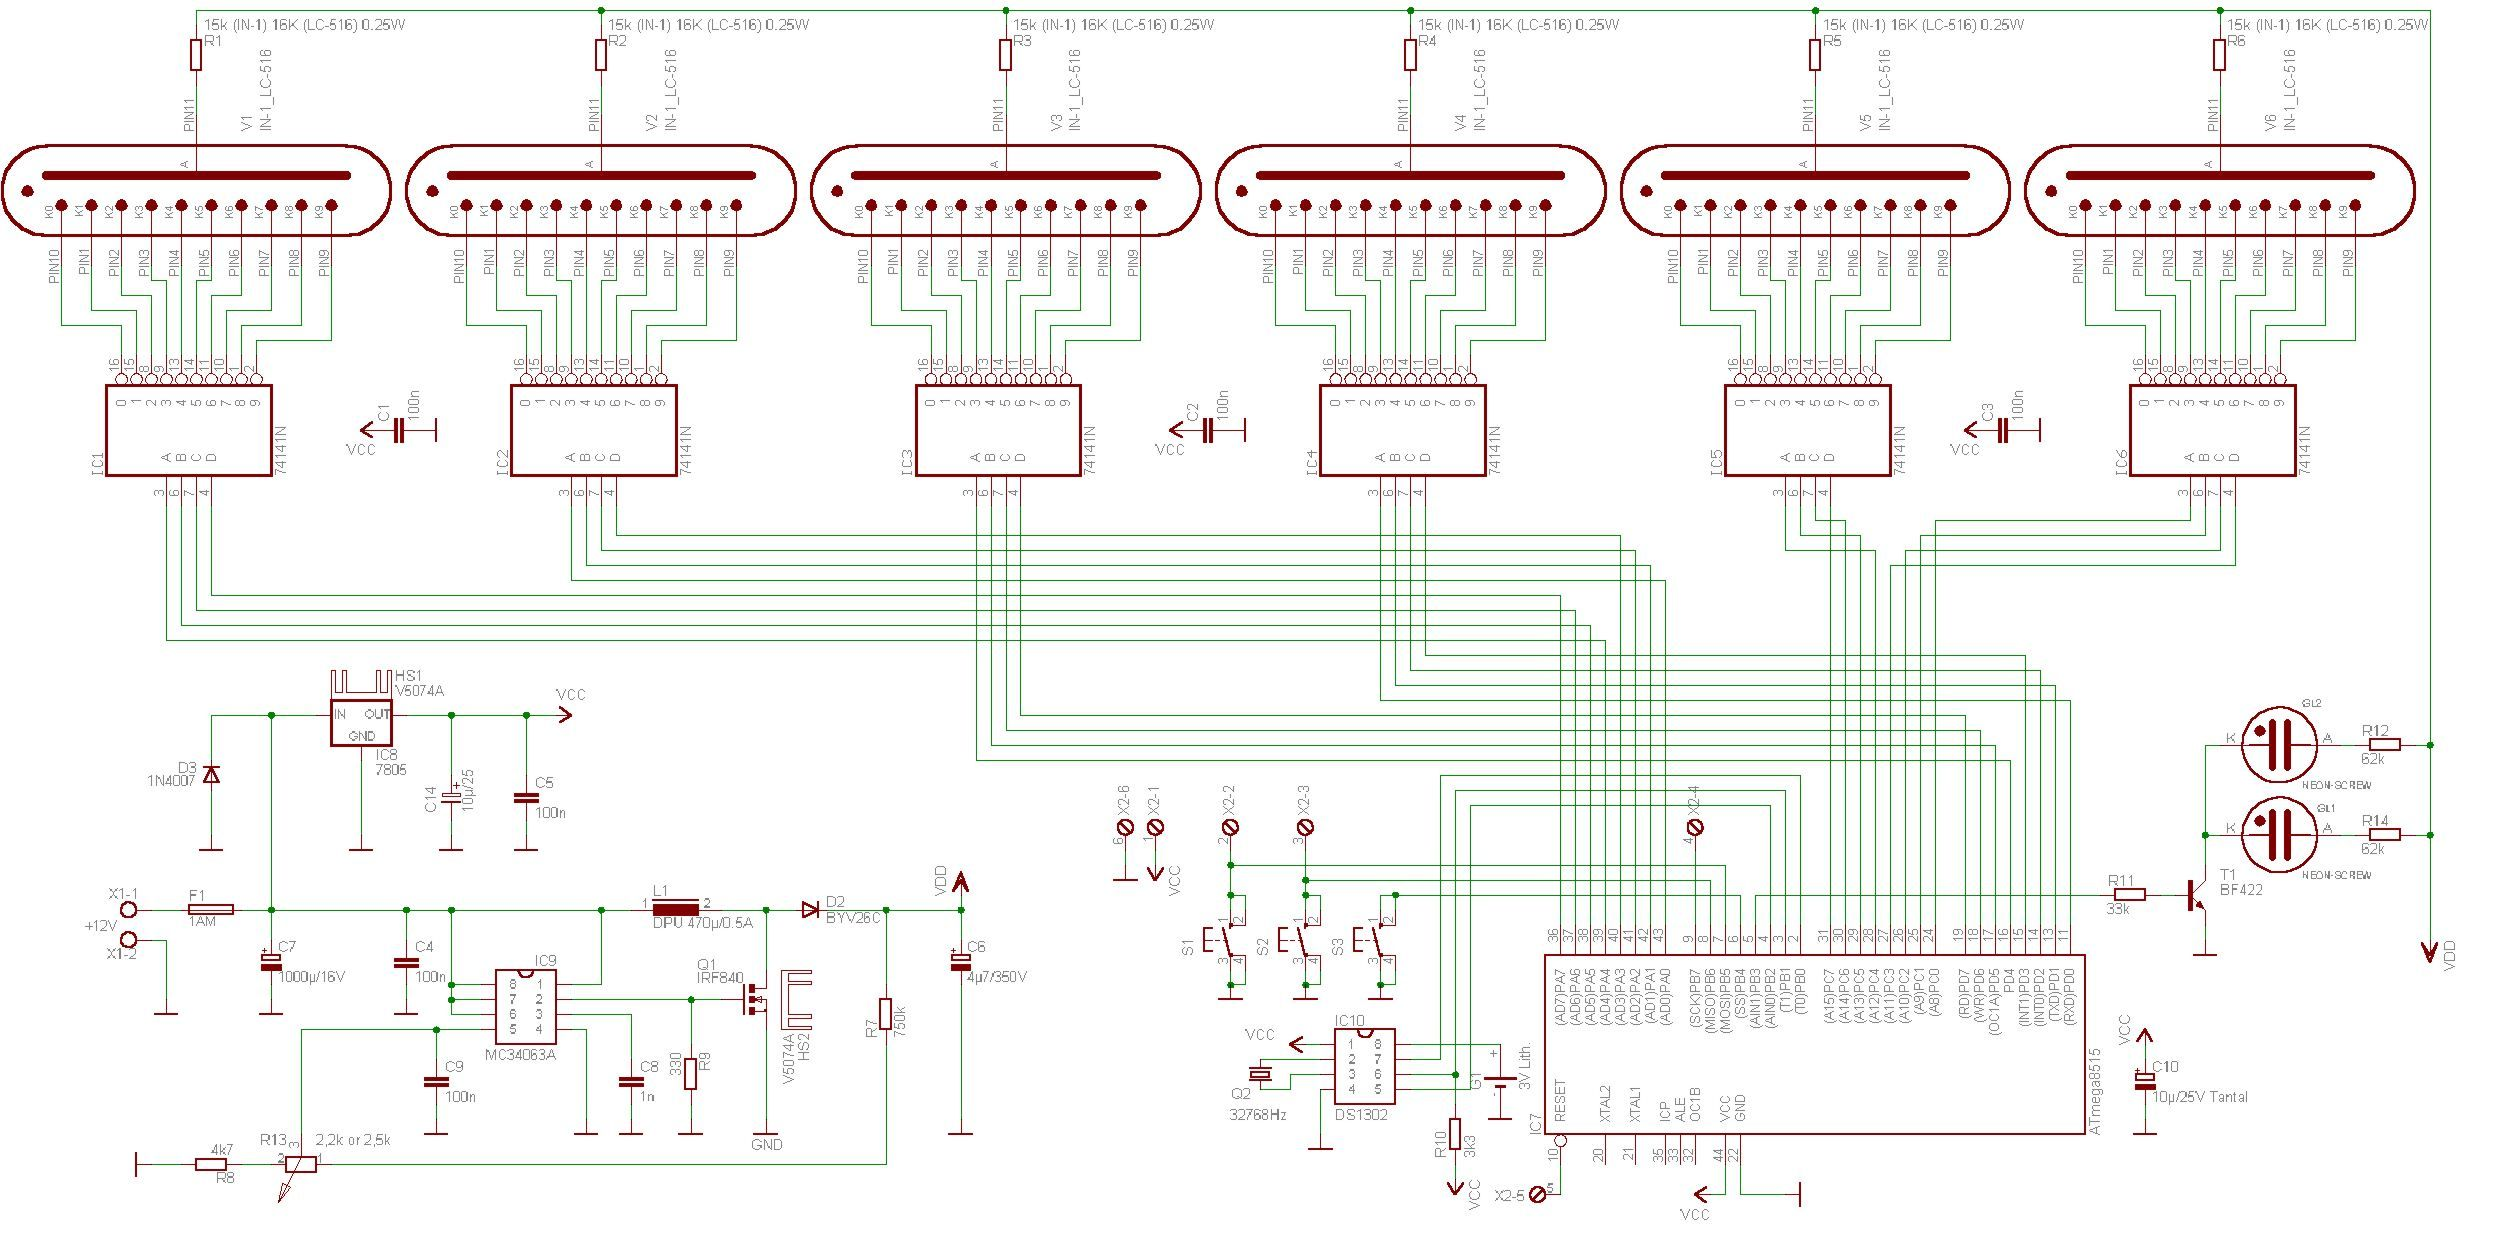 nixietube clock schematic wiring diagram todaynixie tube clock schematics diagram data schema pic nixie clock schematic [ 2493 x 1239 Pixel ]